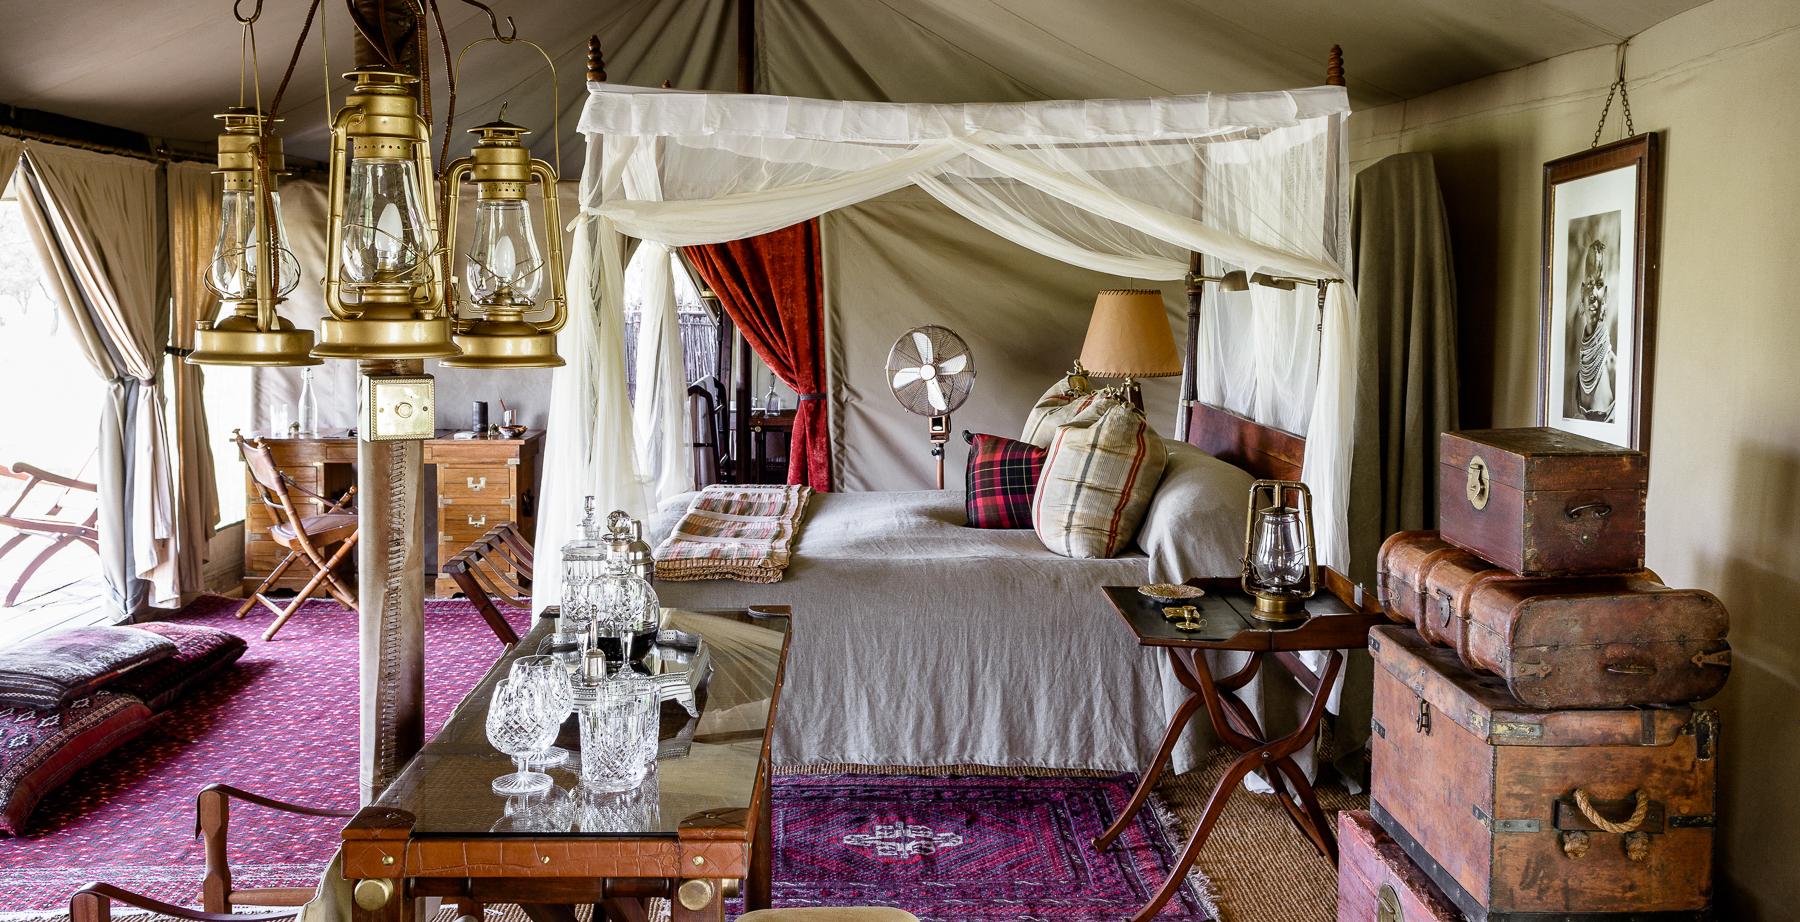 Singita Sabora Camp InteriorSingita Sabora Camp InteriorSingita Sabora Camp Bedroom